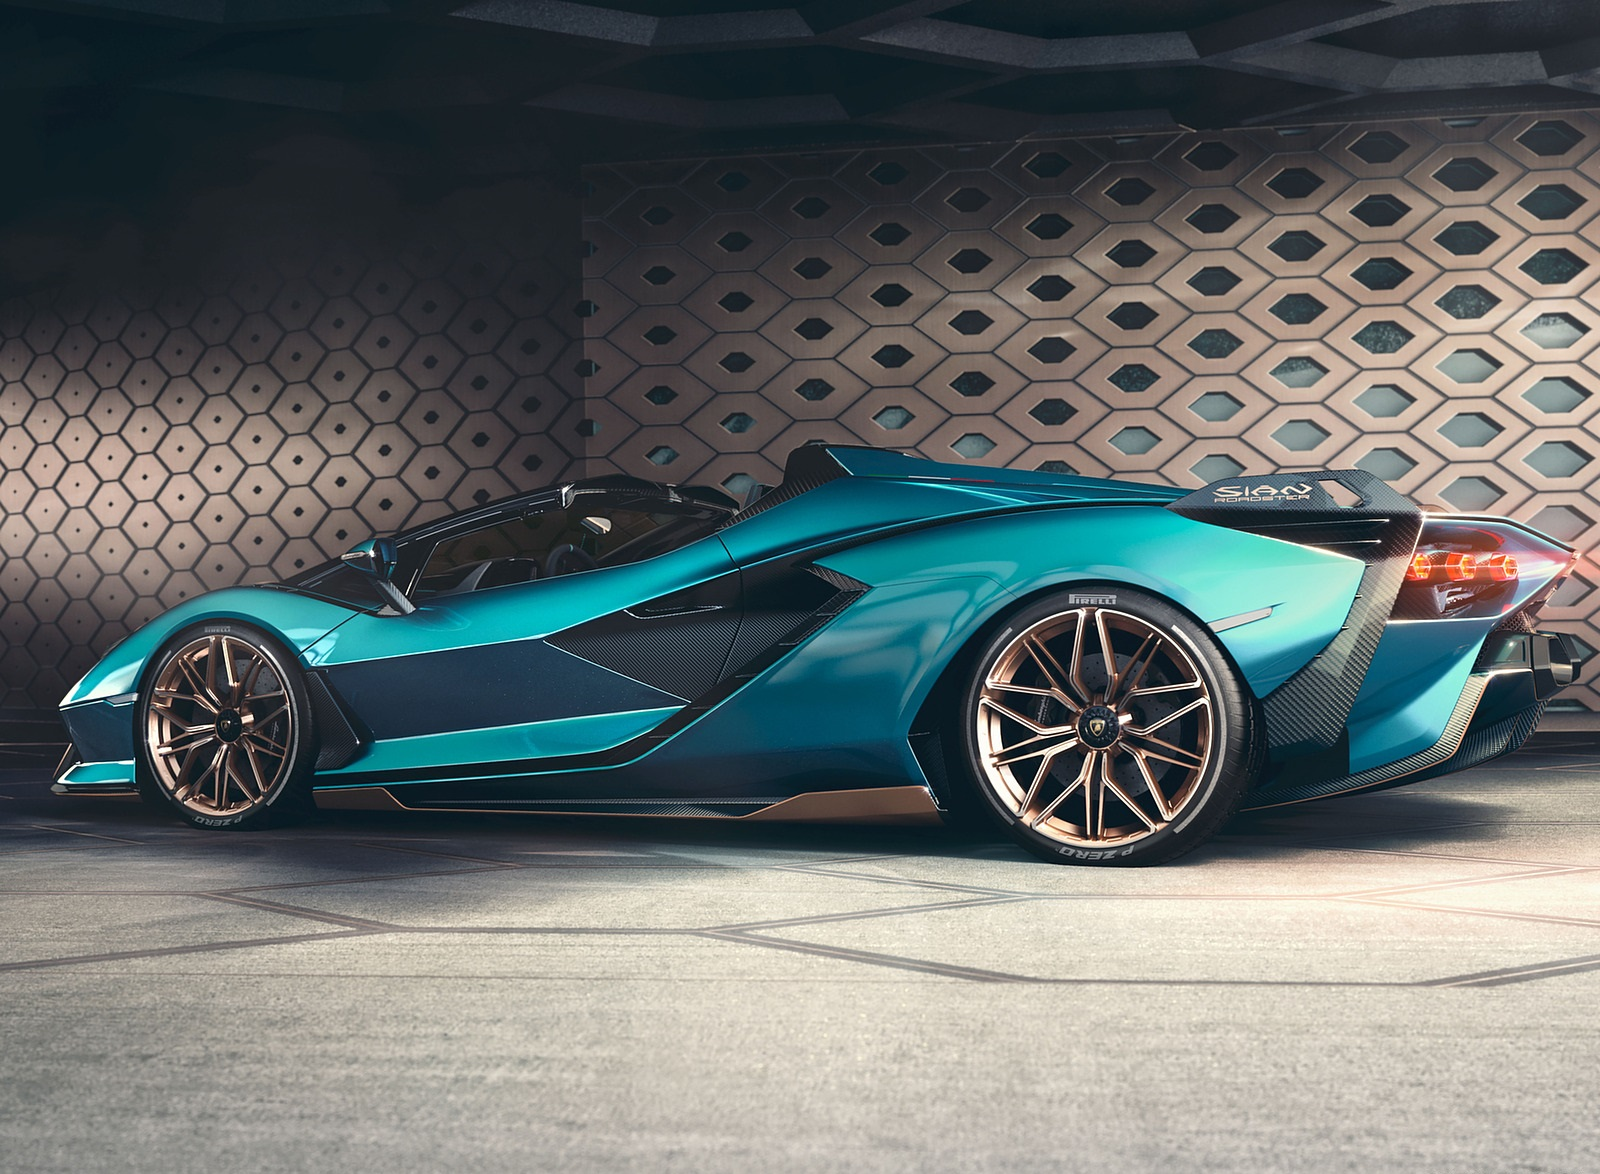 2021 Lamborghini Sián Roadster Side Wallpapers #12 of 19